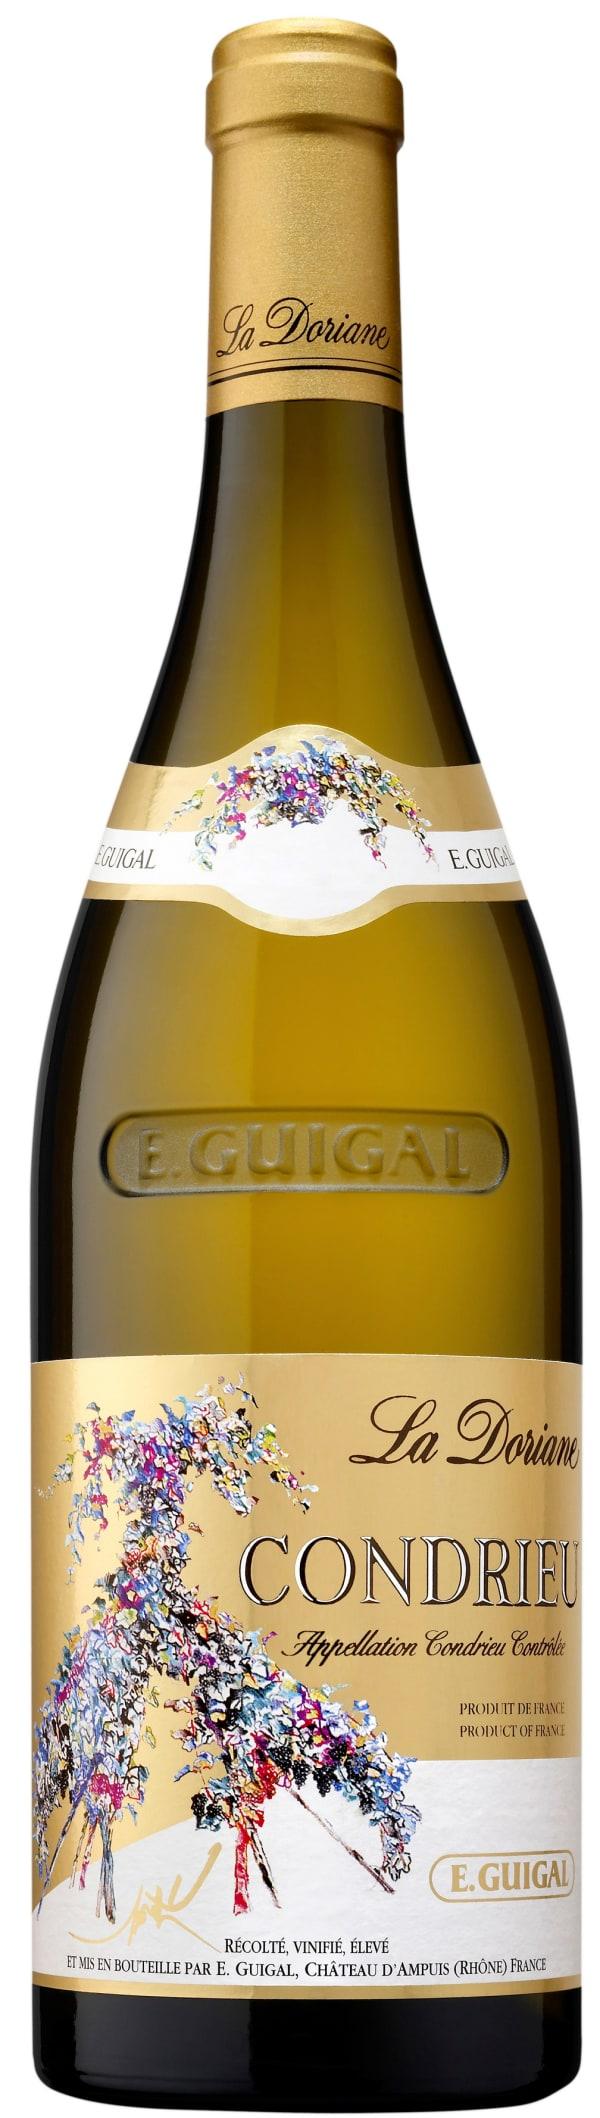 E. Guigal Condrieu La Doriane 2017